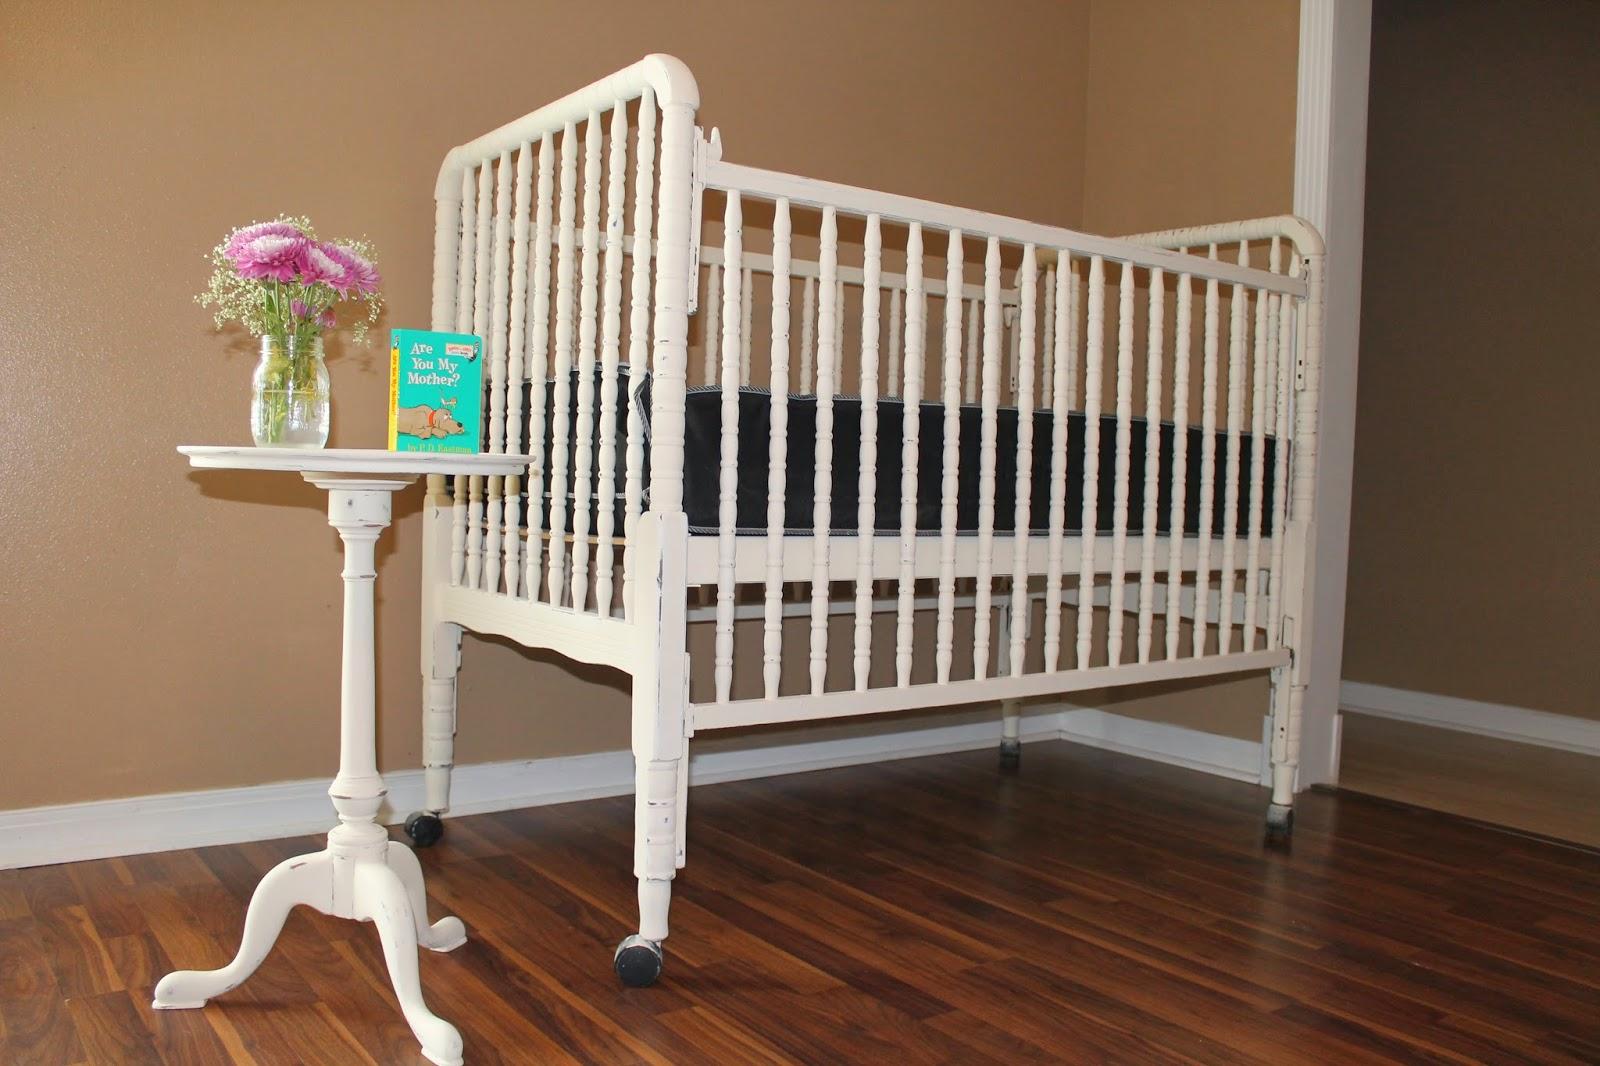 Baby cribs on craigslist - Baby S Crib Redo